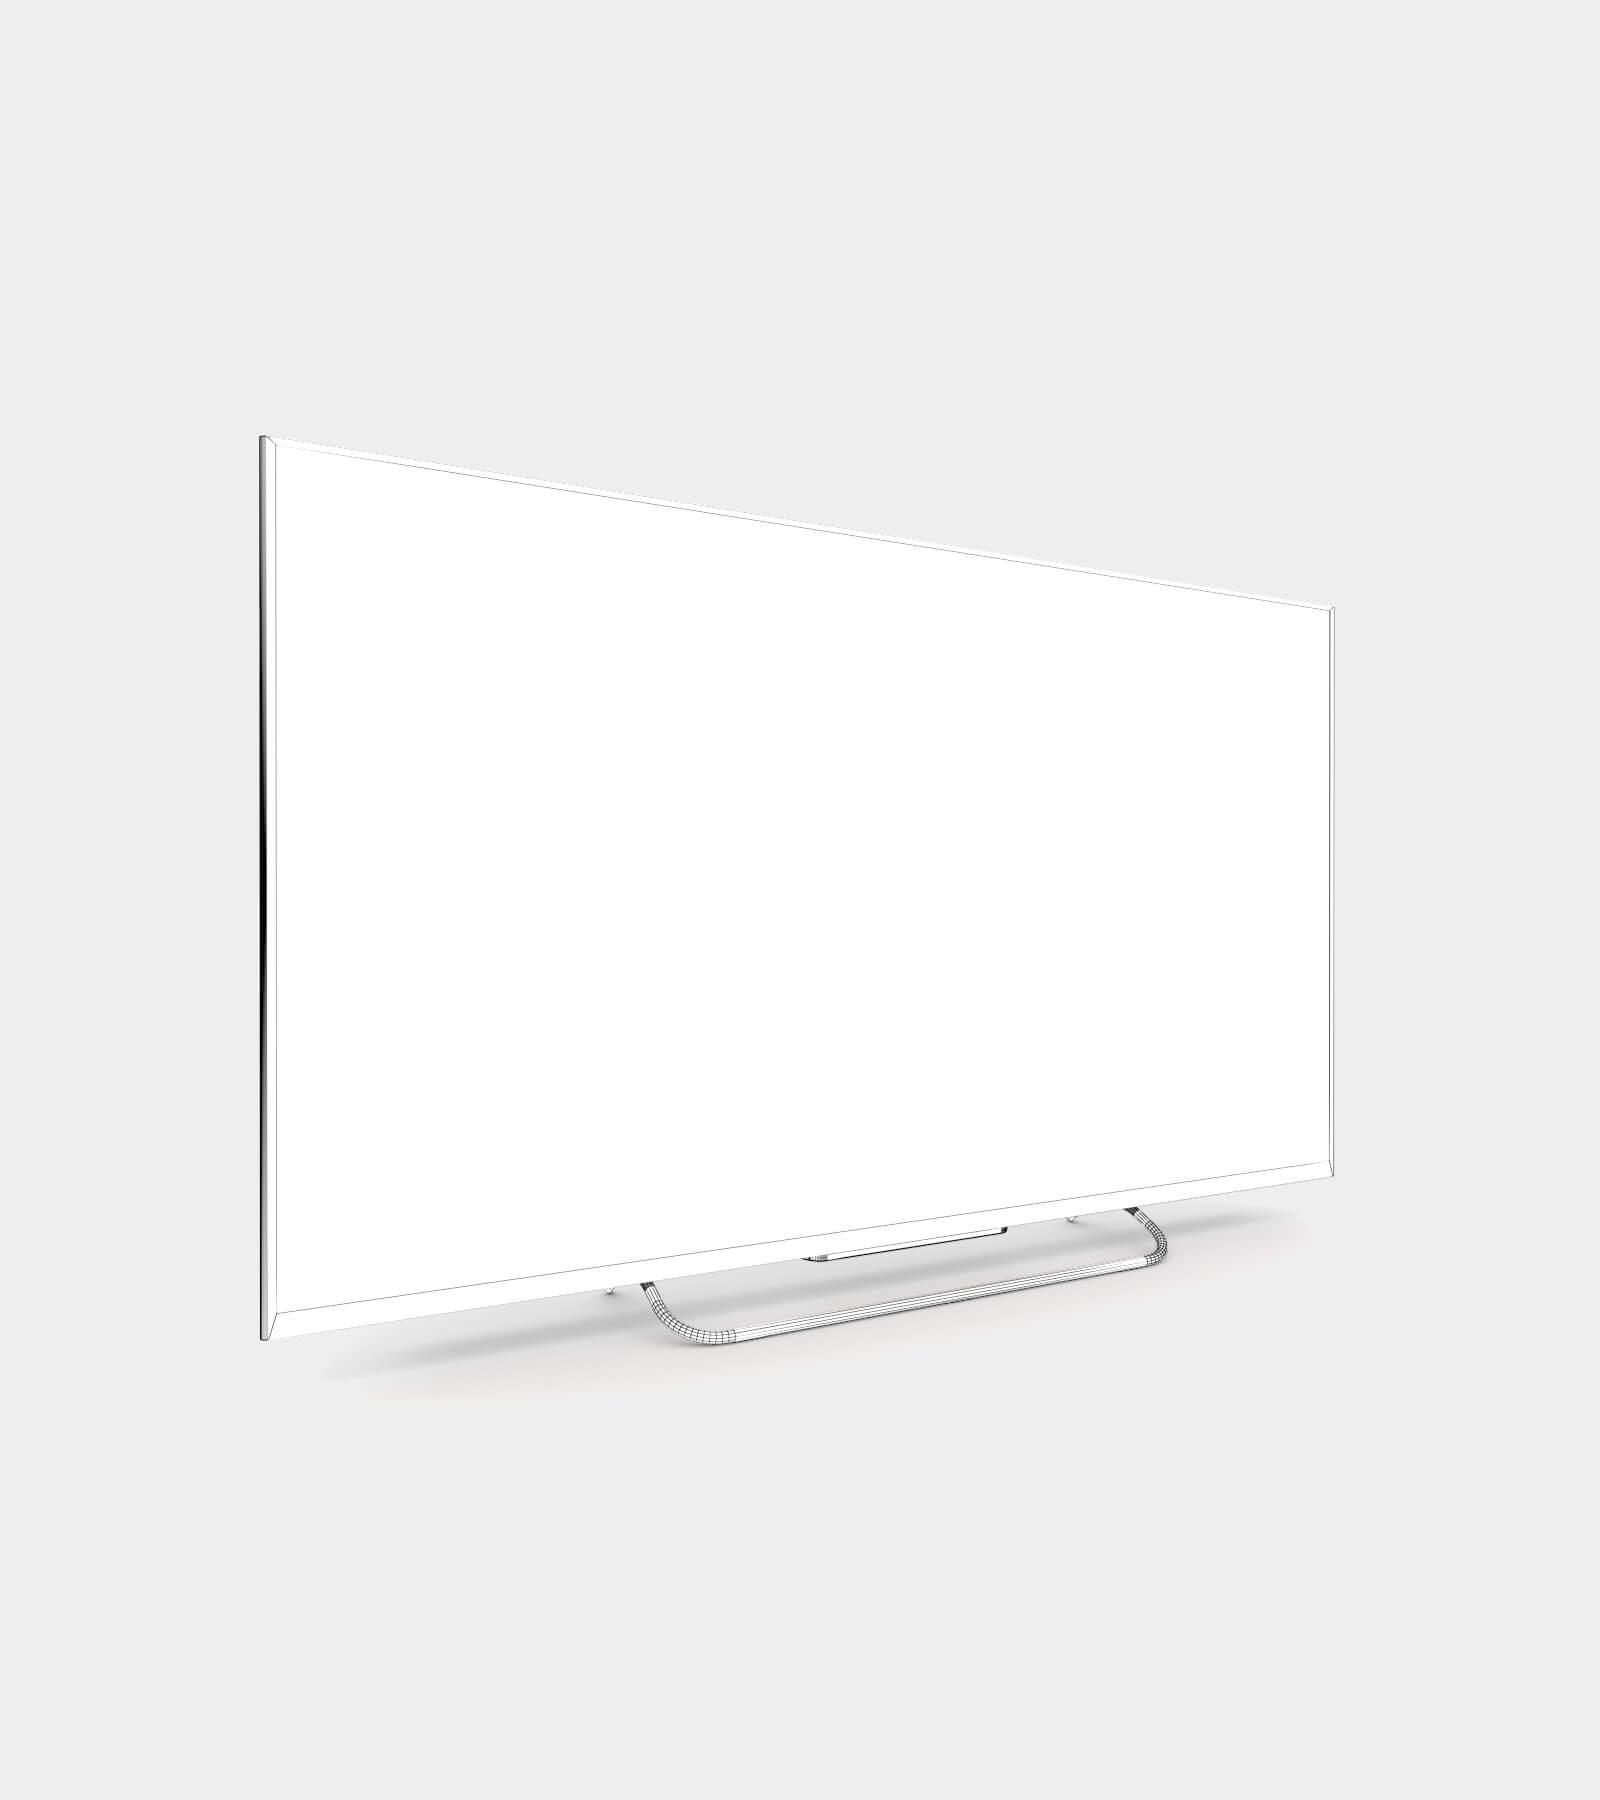 Smart TV-wire-2 3D Model